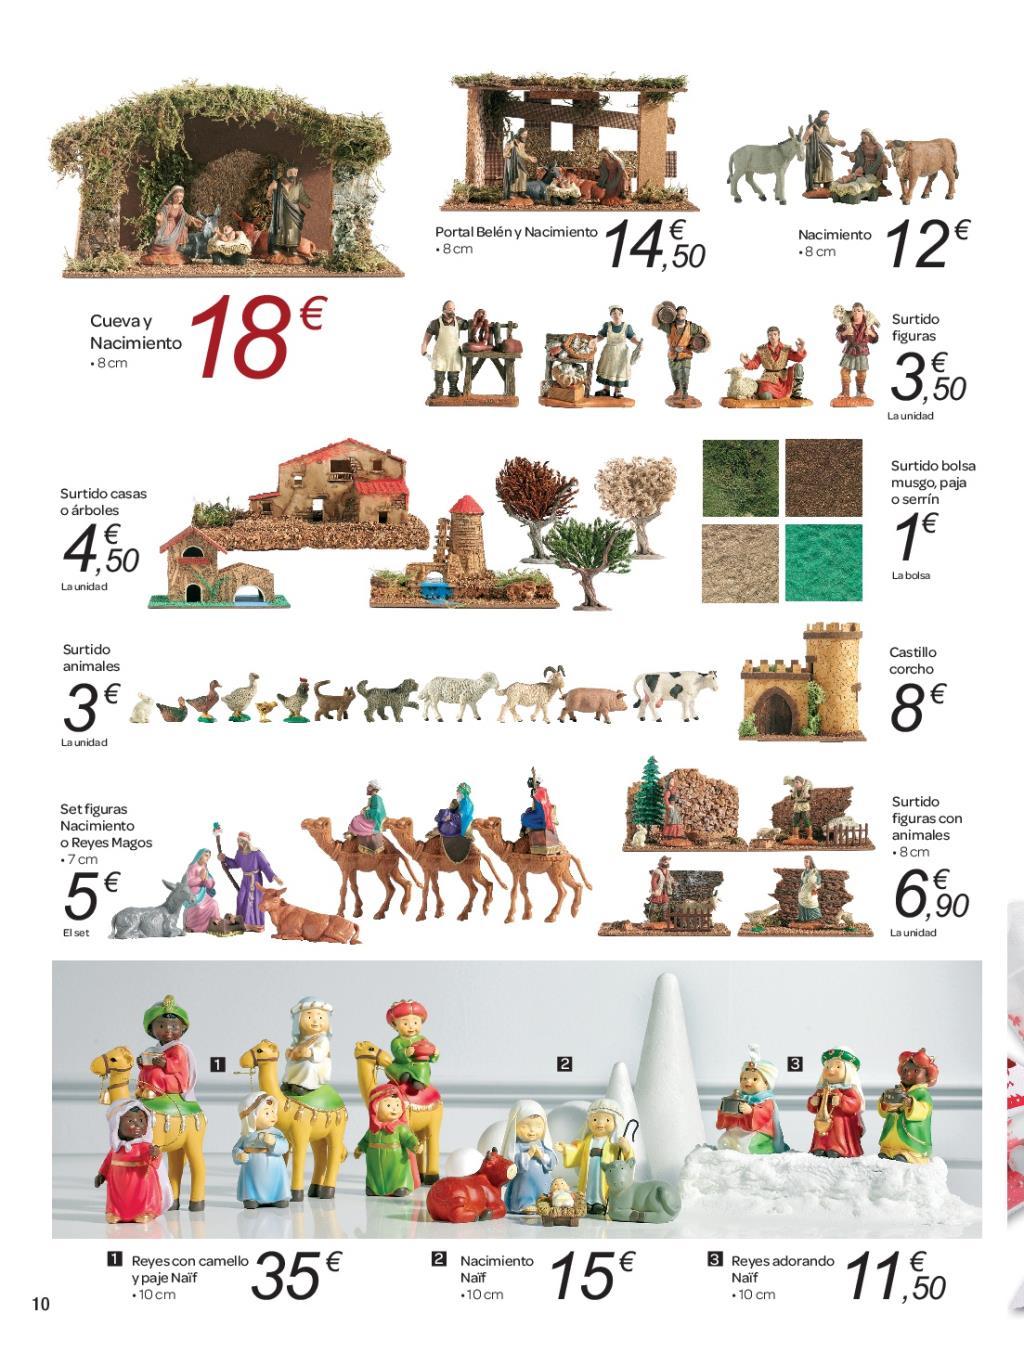 Iluminacion Baño Carrefour:Adornos de Navidad Carrefour 2015 (10/16)